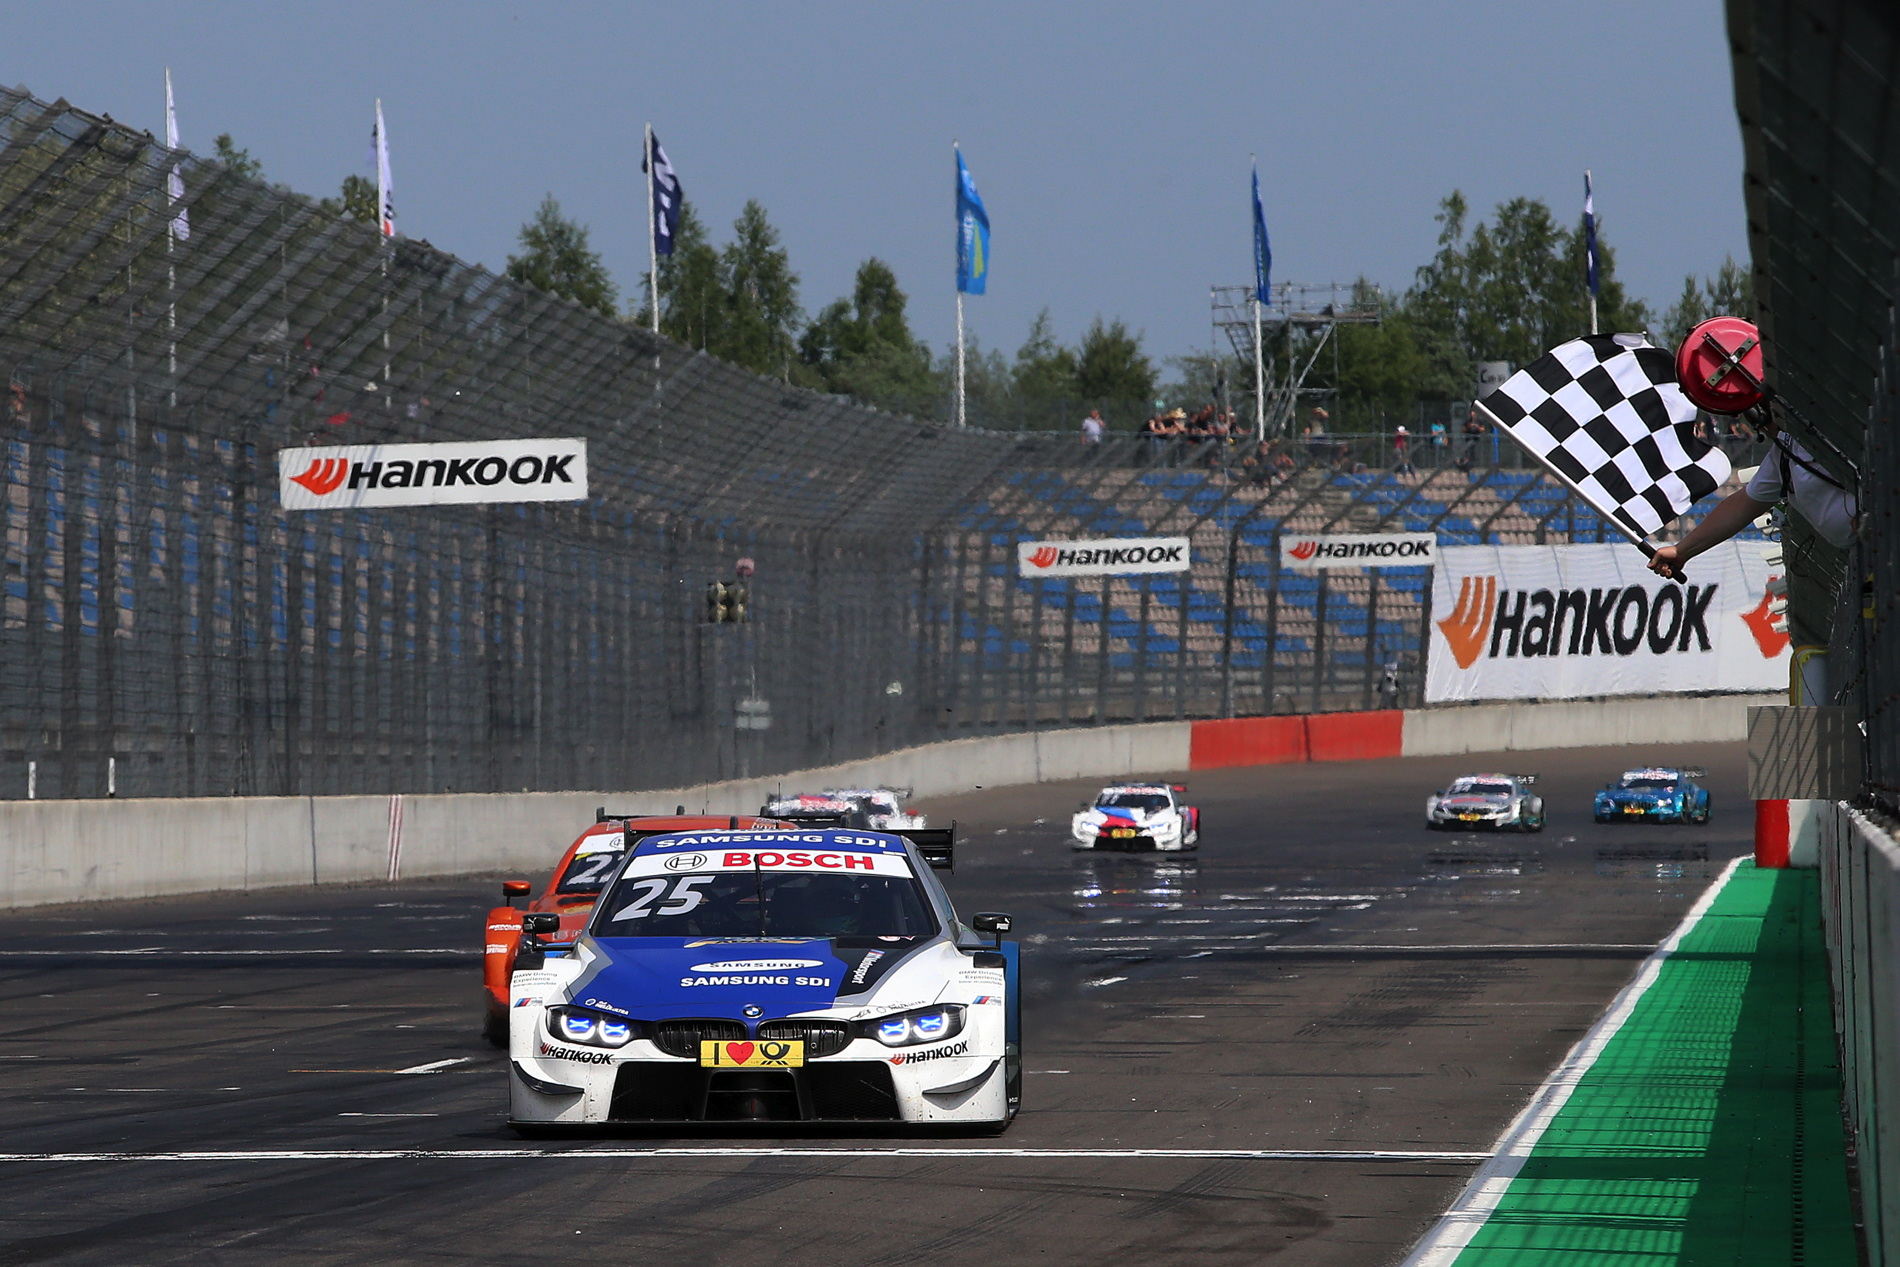 2018 DTM Lausitzring 04